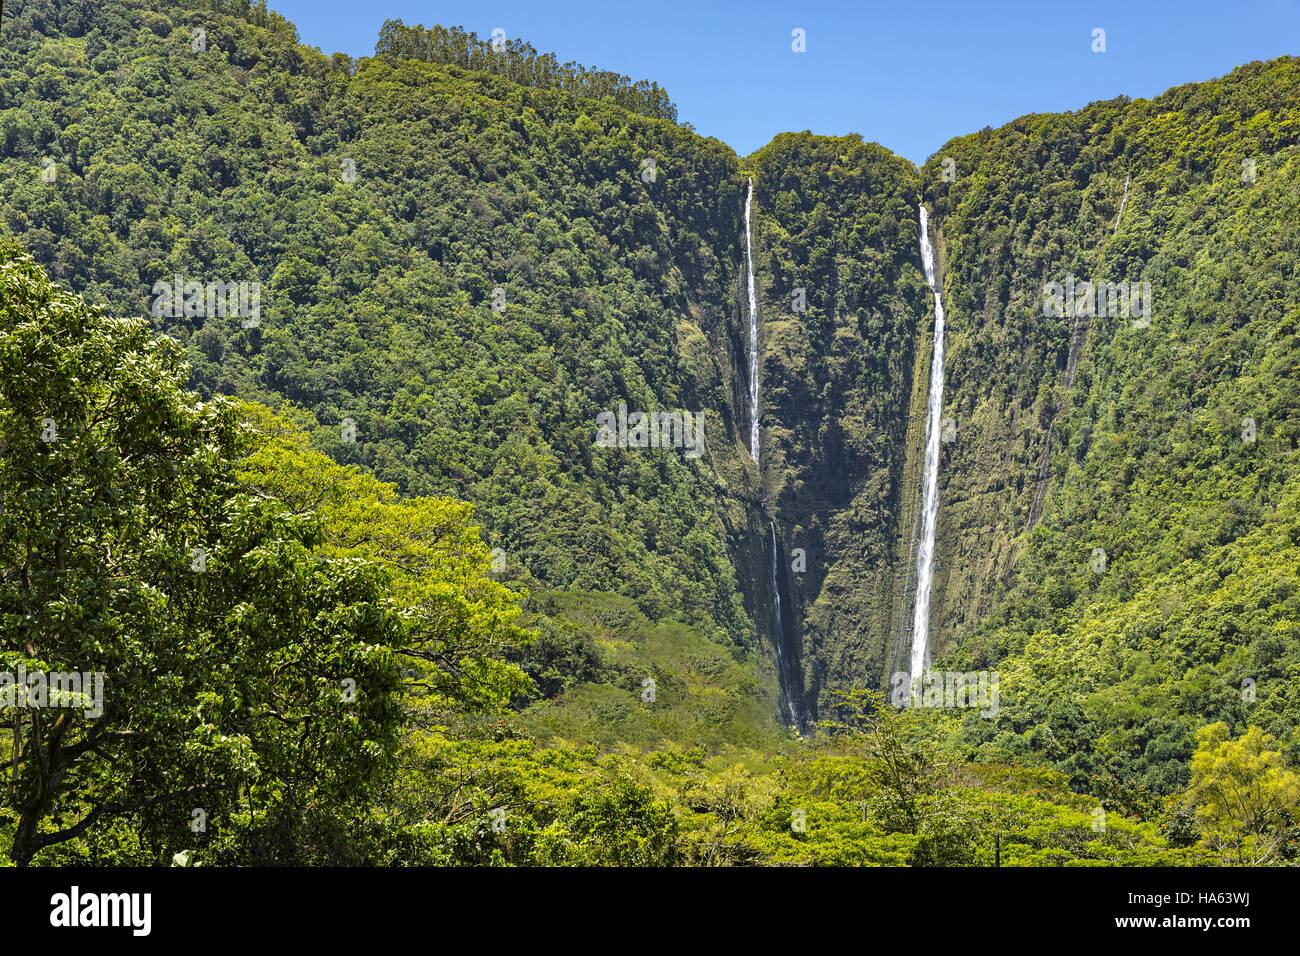 Rainforest On The Big Island: Waipio Falls In A Tropical Rainforest In The Waipio Valley